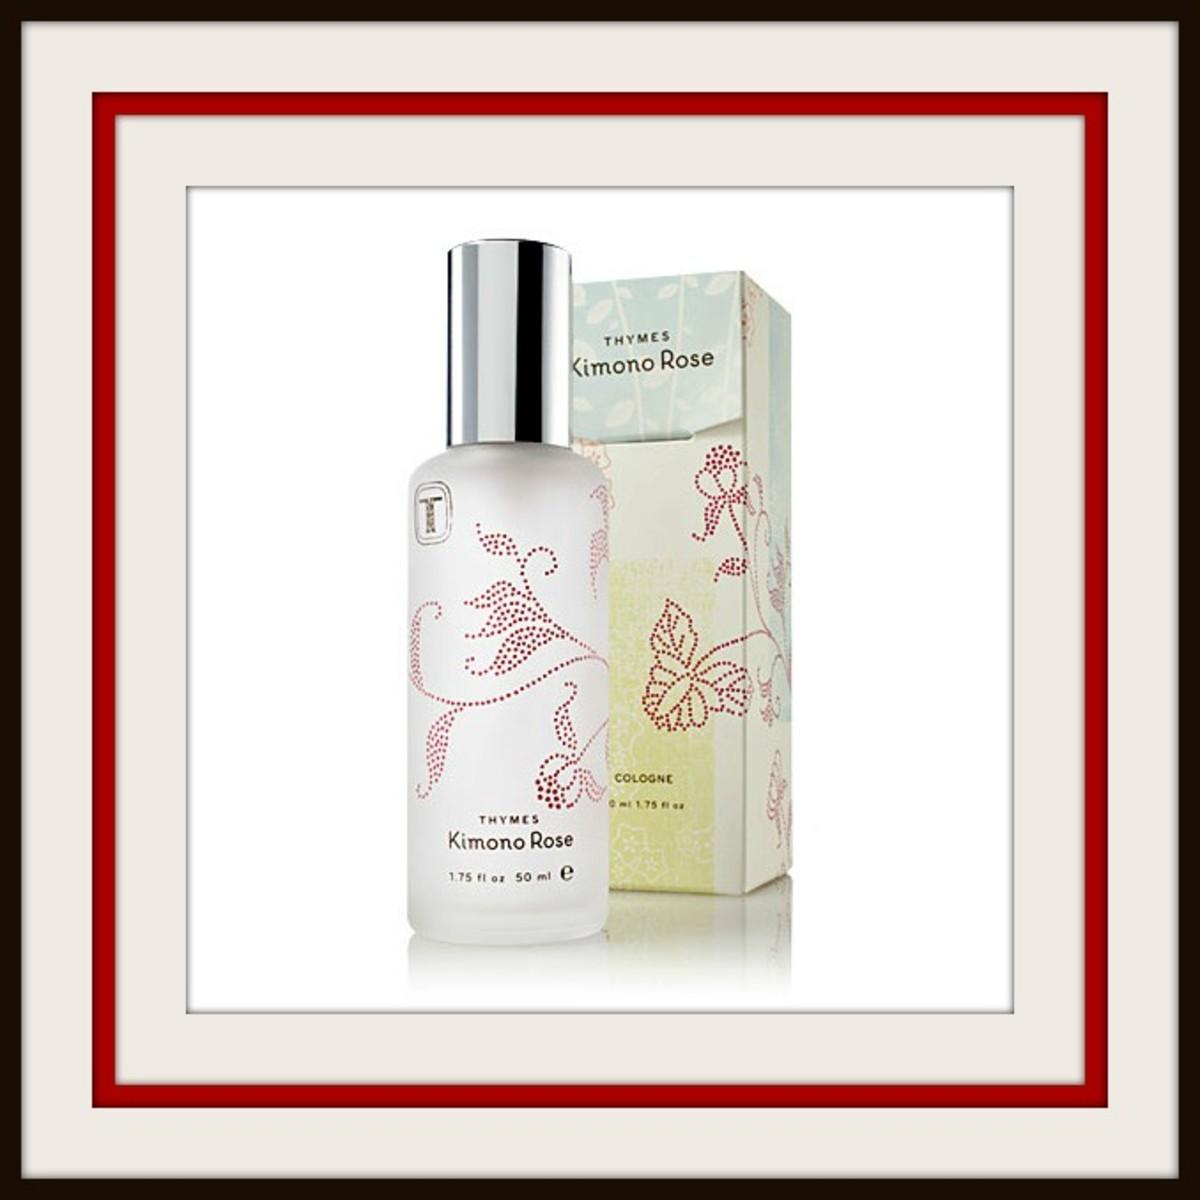 Kimono-Rose-Cologne-0620320107-470-1